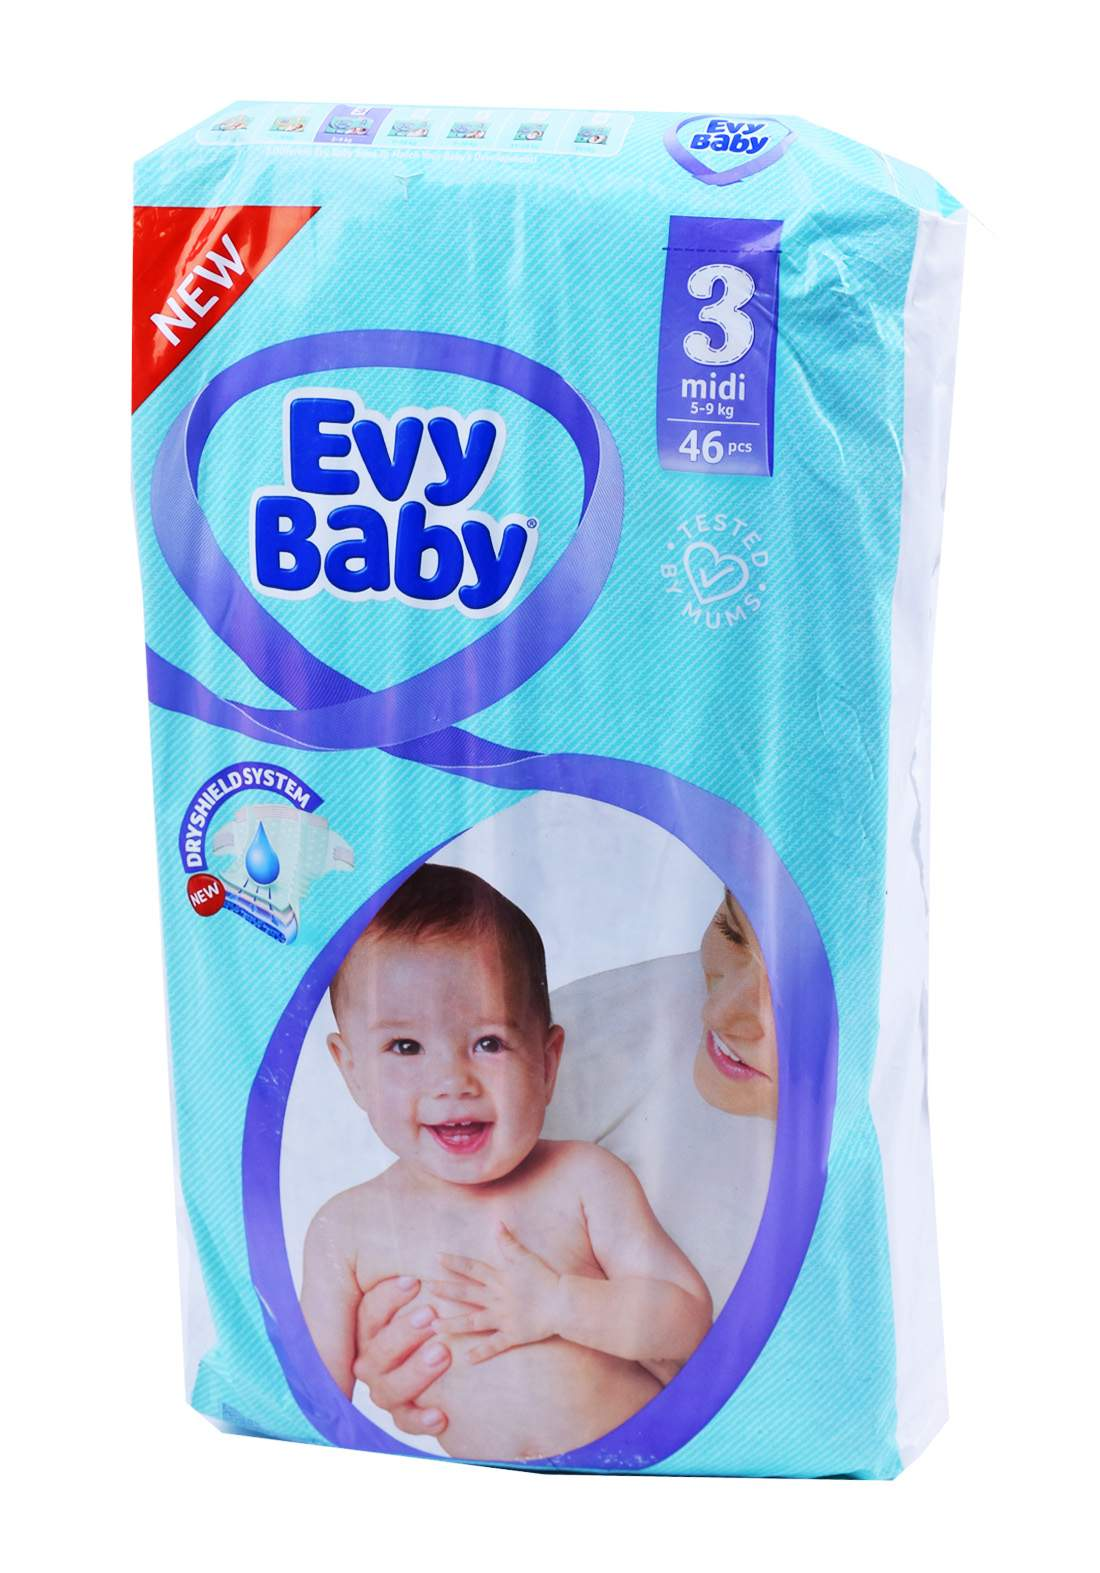 Evy Baby Diapers 3 Midi 5-9 Kg 46 Pcs 3 حفاضات ايفي بيبي للاطفال عادي رقم